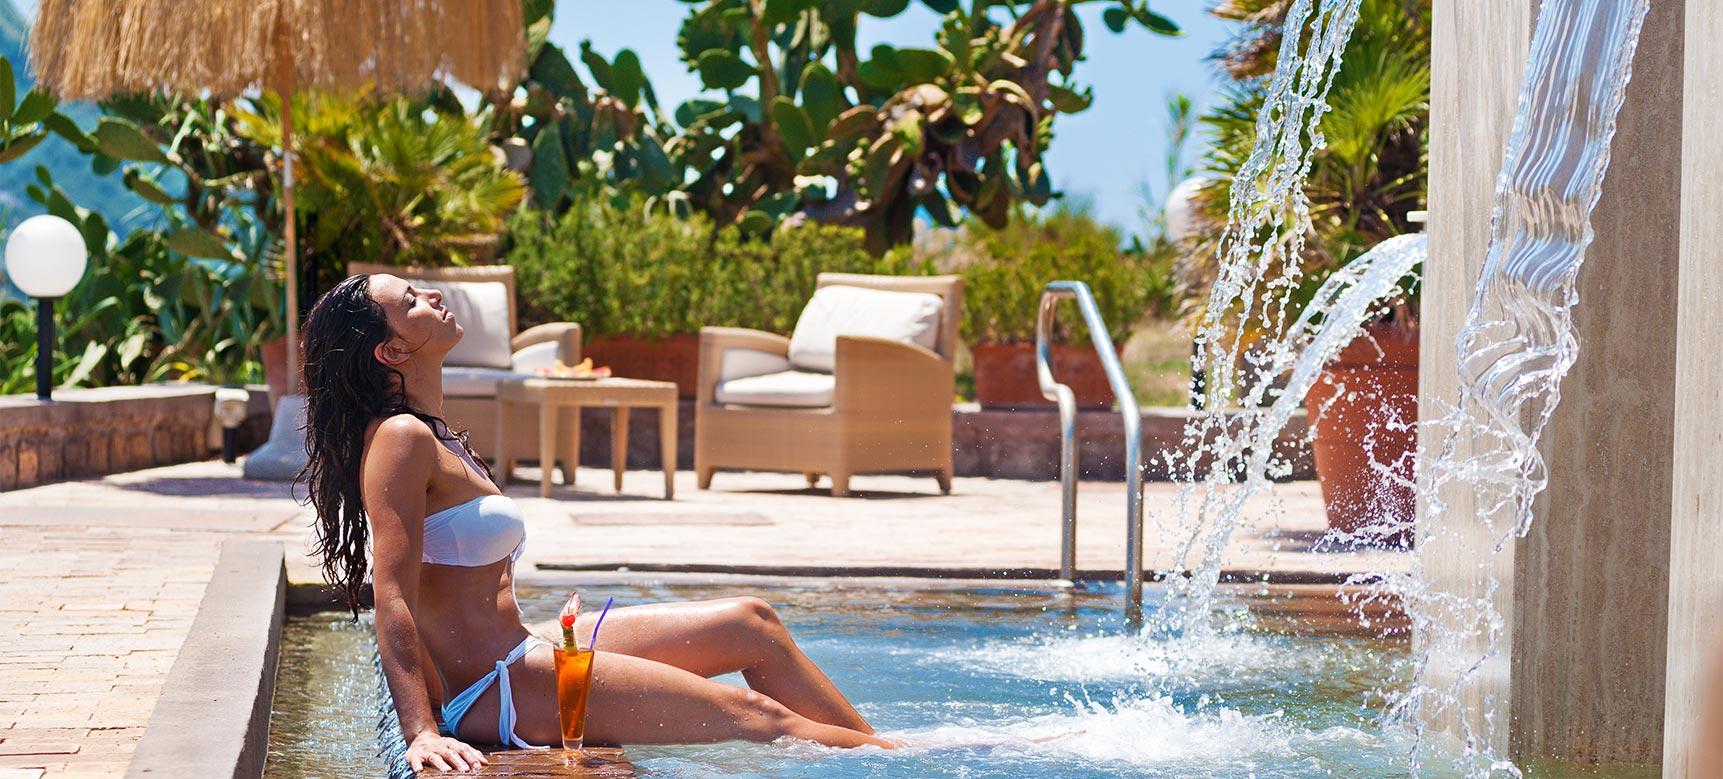 san-montano-resort-piscina-esterna-lame-d-acqua